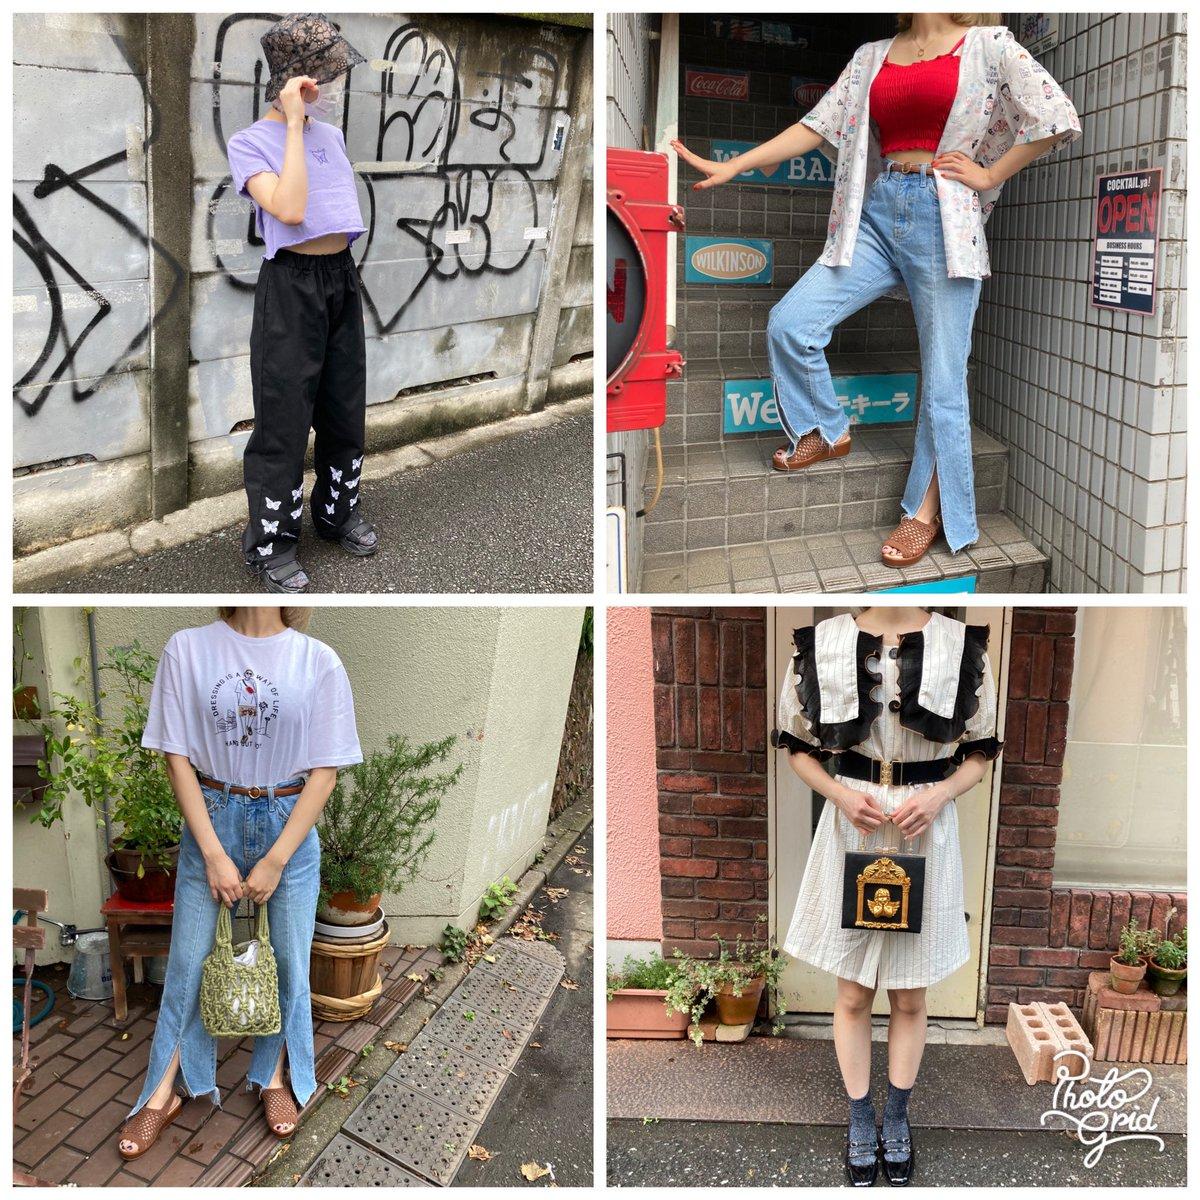 New Arrival ・ 新作アイテム多数入荷しております ぜひ、ご覧ください ・ ♡ONLINE SHOP掲載商品です♡トップページからぜひご覧下さい♡  ・ #mocha下北沢 #下北沢  #shimokitazawa #fashionstagram  #tokyo #japan #l4l #dailylook #패션 #패션스타그램 #セレクトショップpic.twitter.com/F5Oygz7AuW